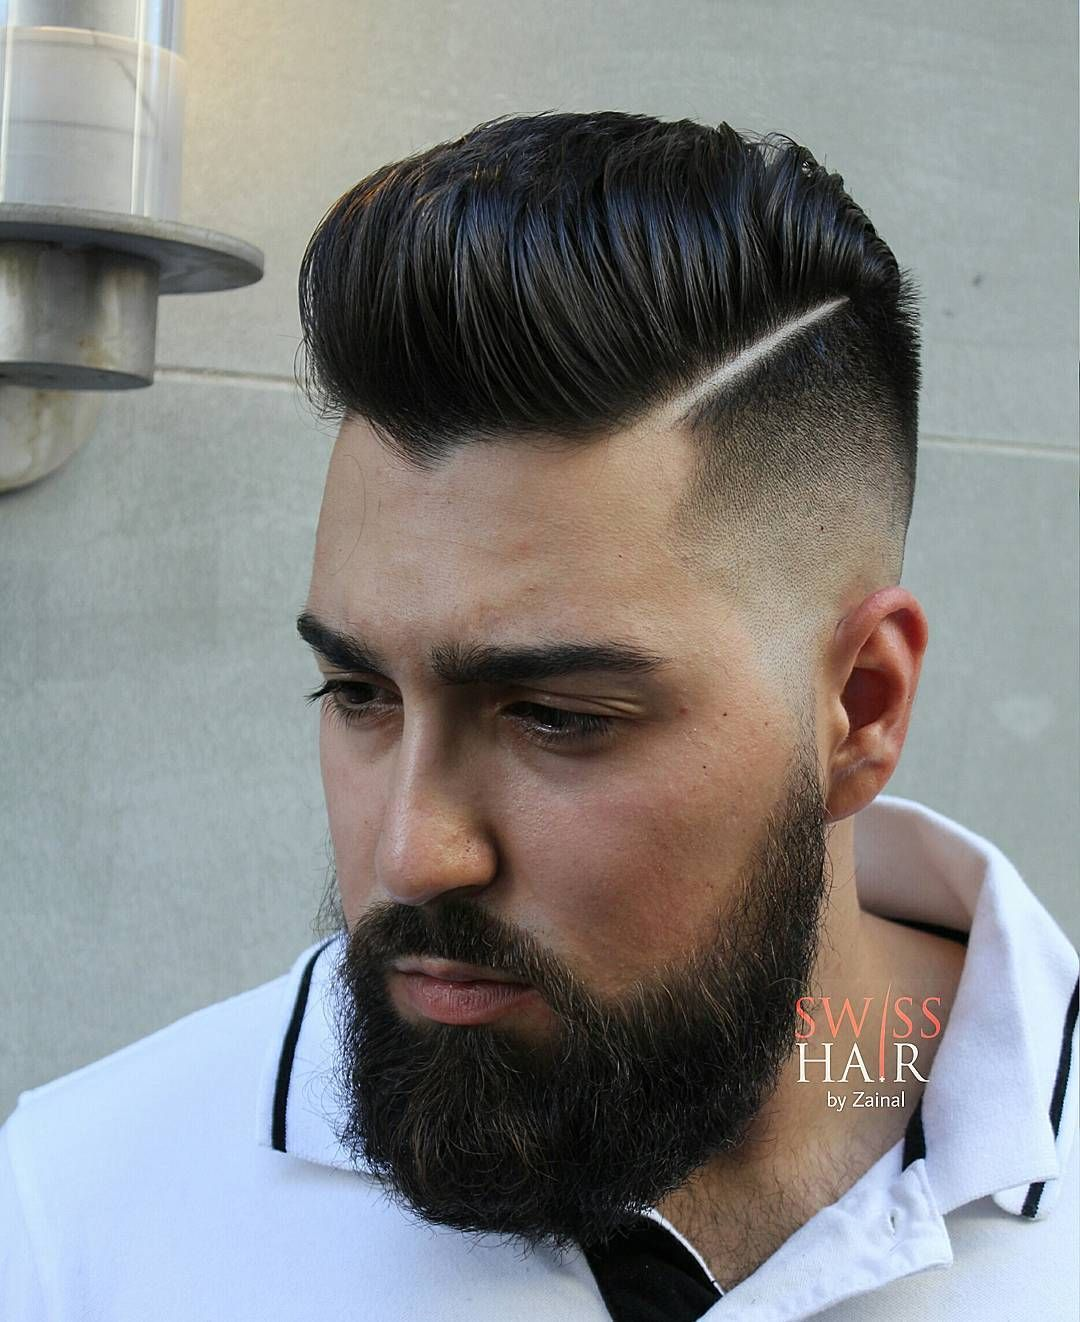 Barber And Hairstylist Zainal Swisshairbyzainal Fotos Y Videos De Instagram Pompadour Hairstyle Pompadour Haircut Mens Hairstyles Pompadour